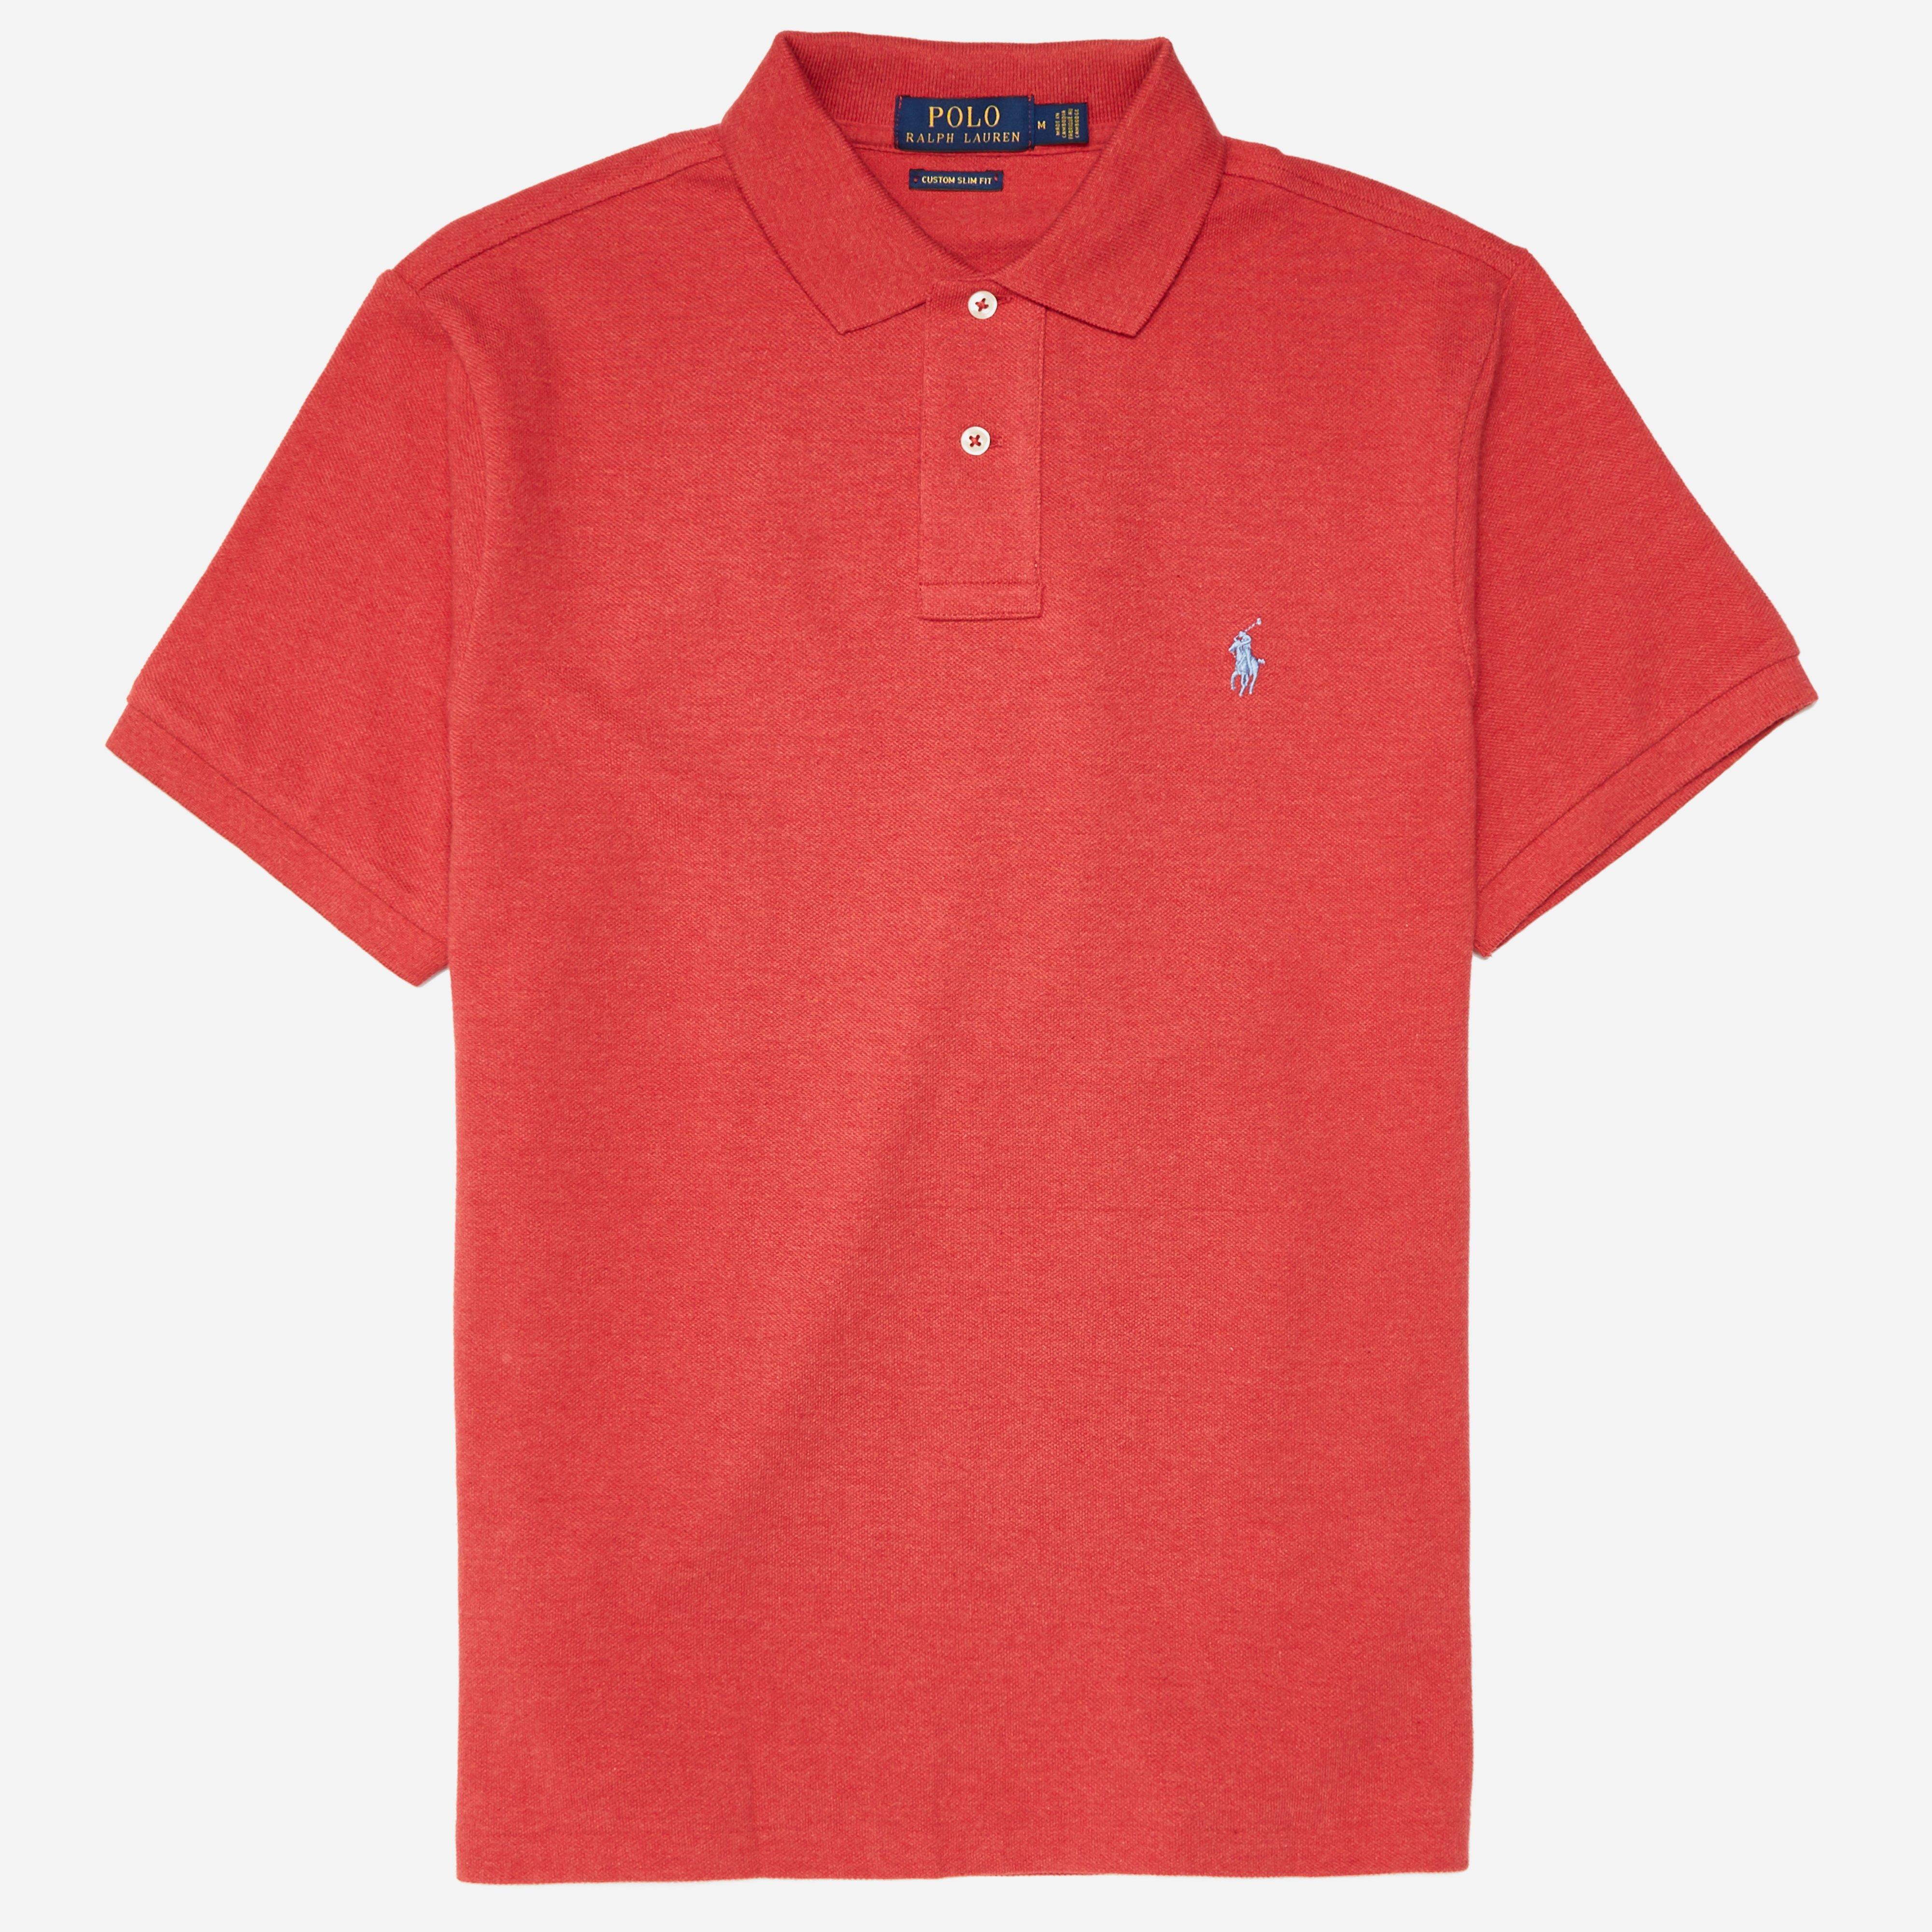 Polo Ralph Lauren Basic Mesh Knitted Polo Shirt